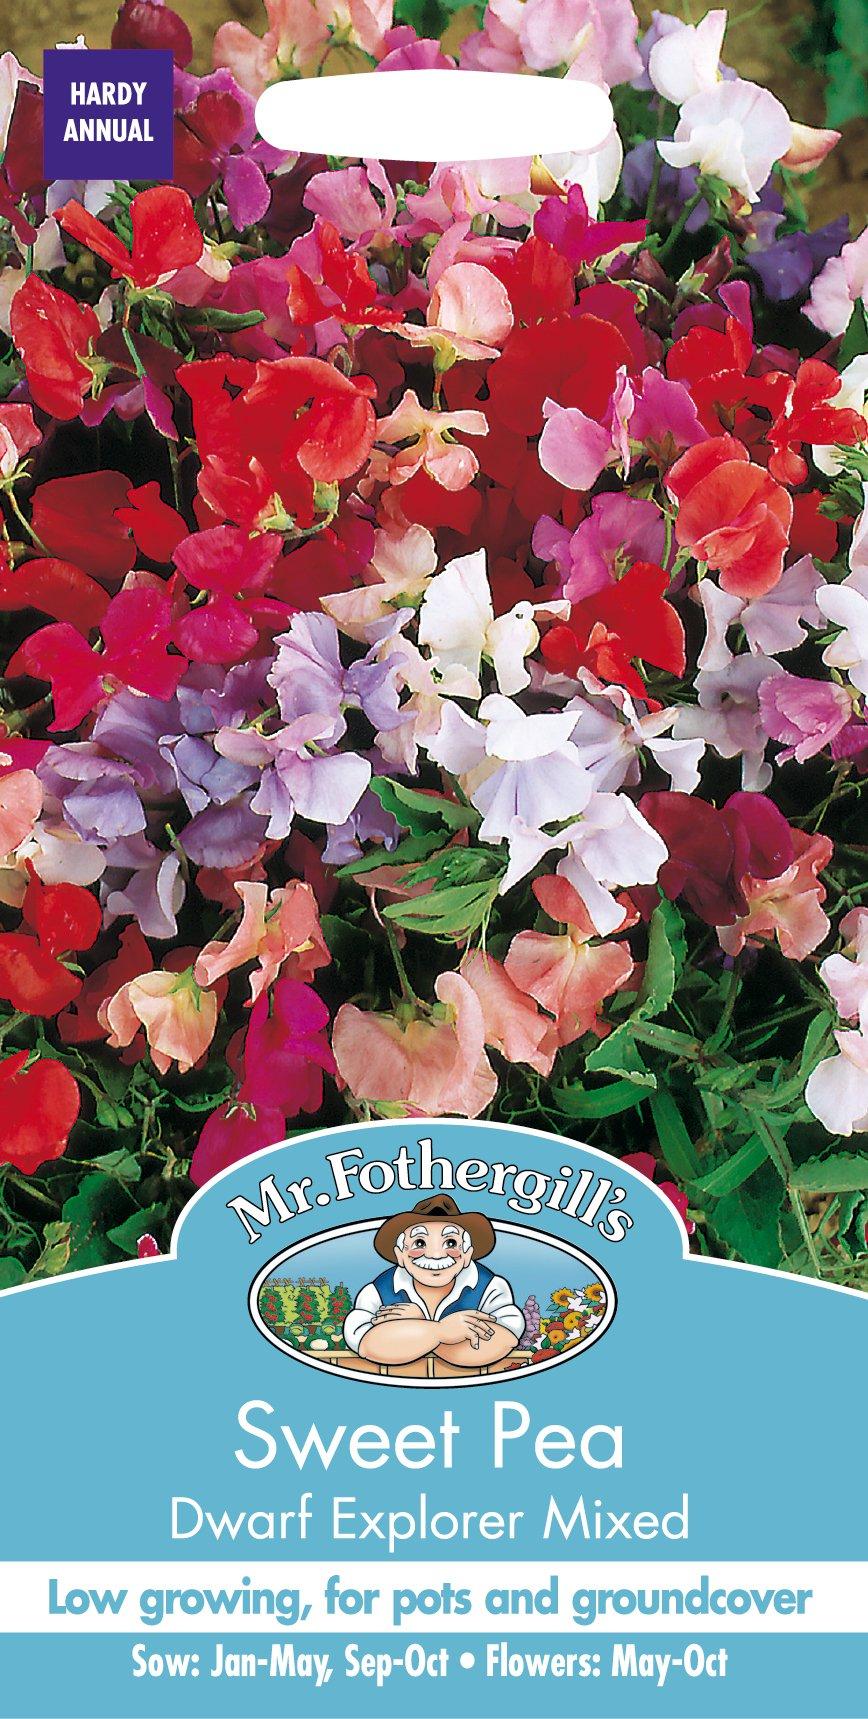 Mr Fothergill's 22991 Flower Seeds, Sweet Pea Dwarf Explorer Mixed